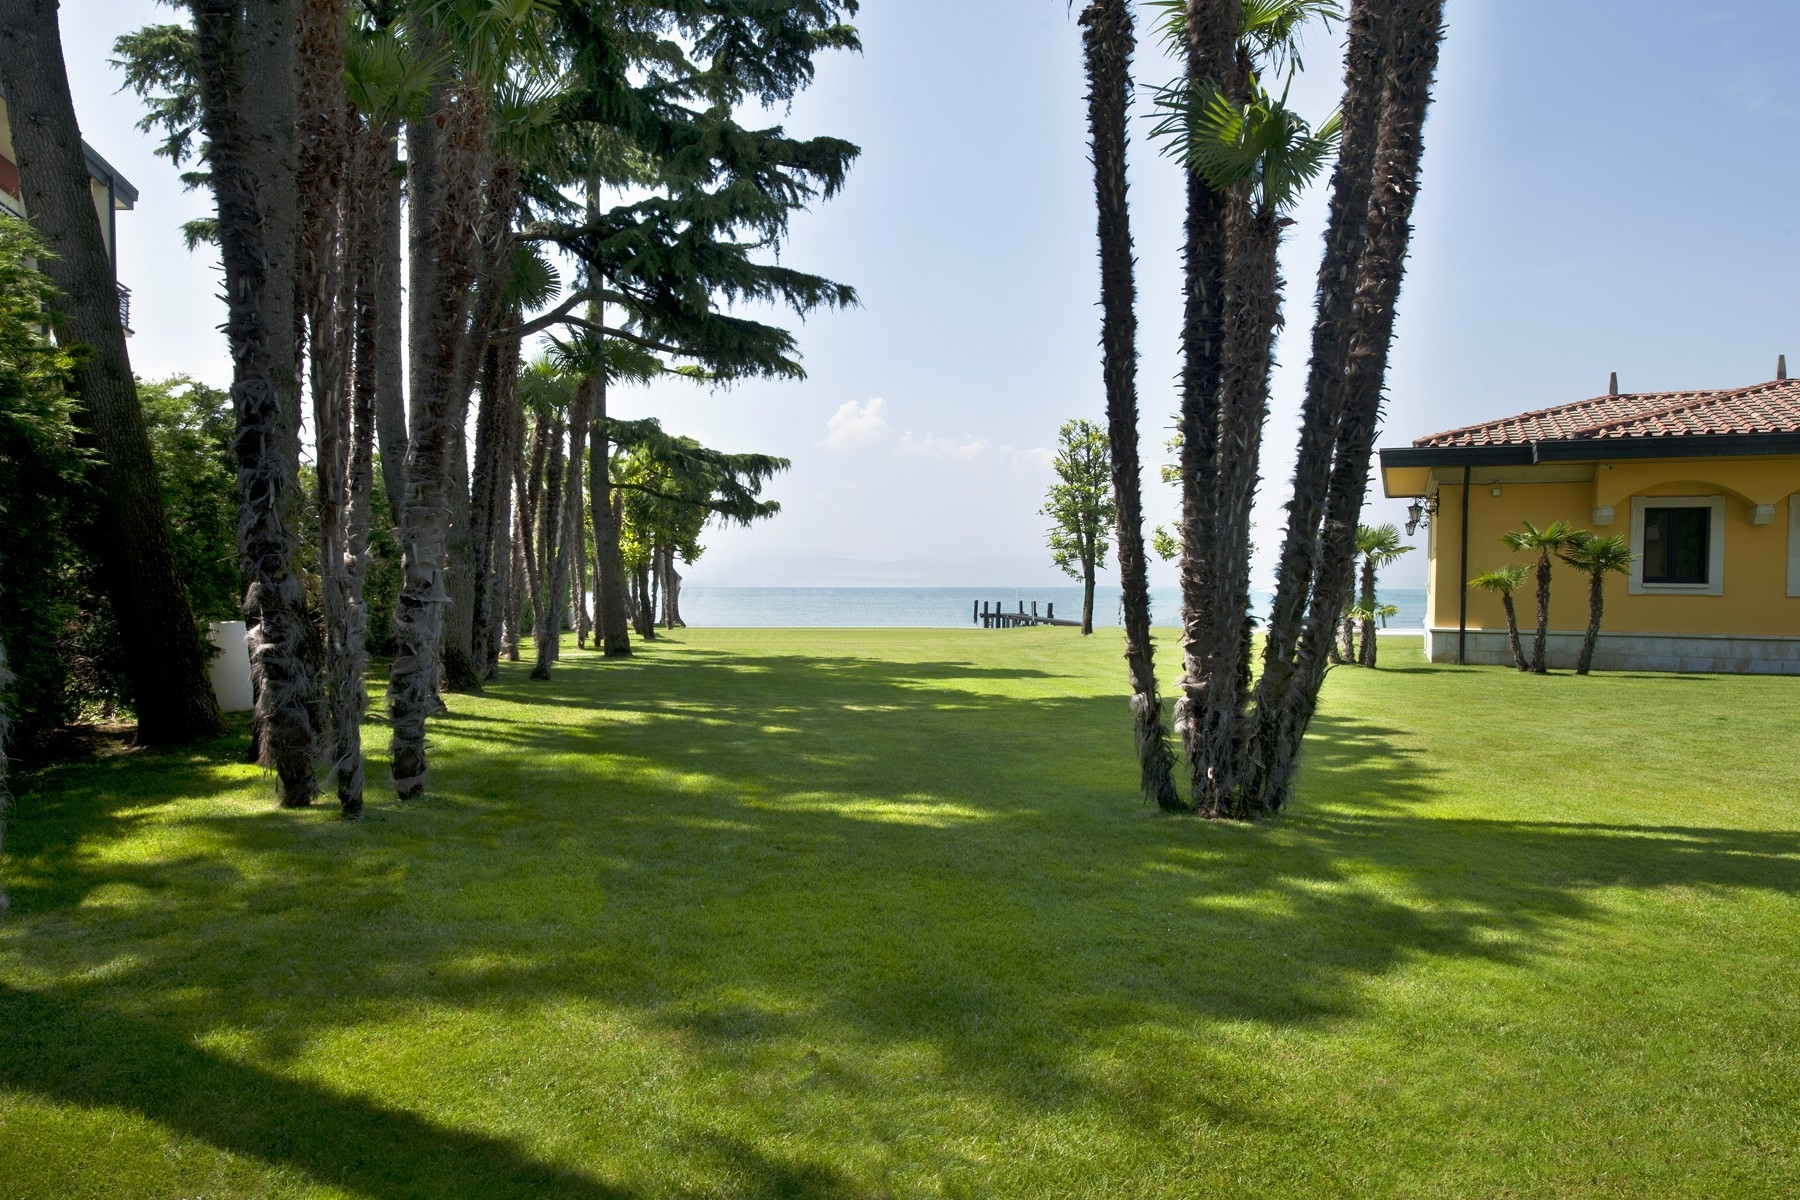 Villa in Vendita a Sirmione: 5 locali, 550 mq - Foto 10